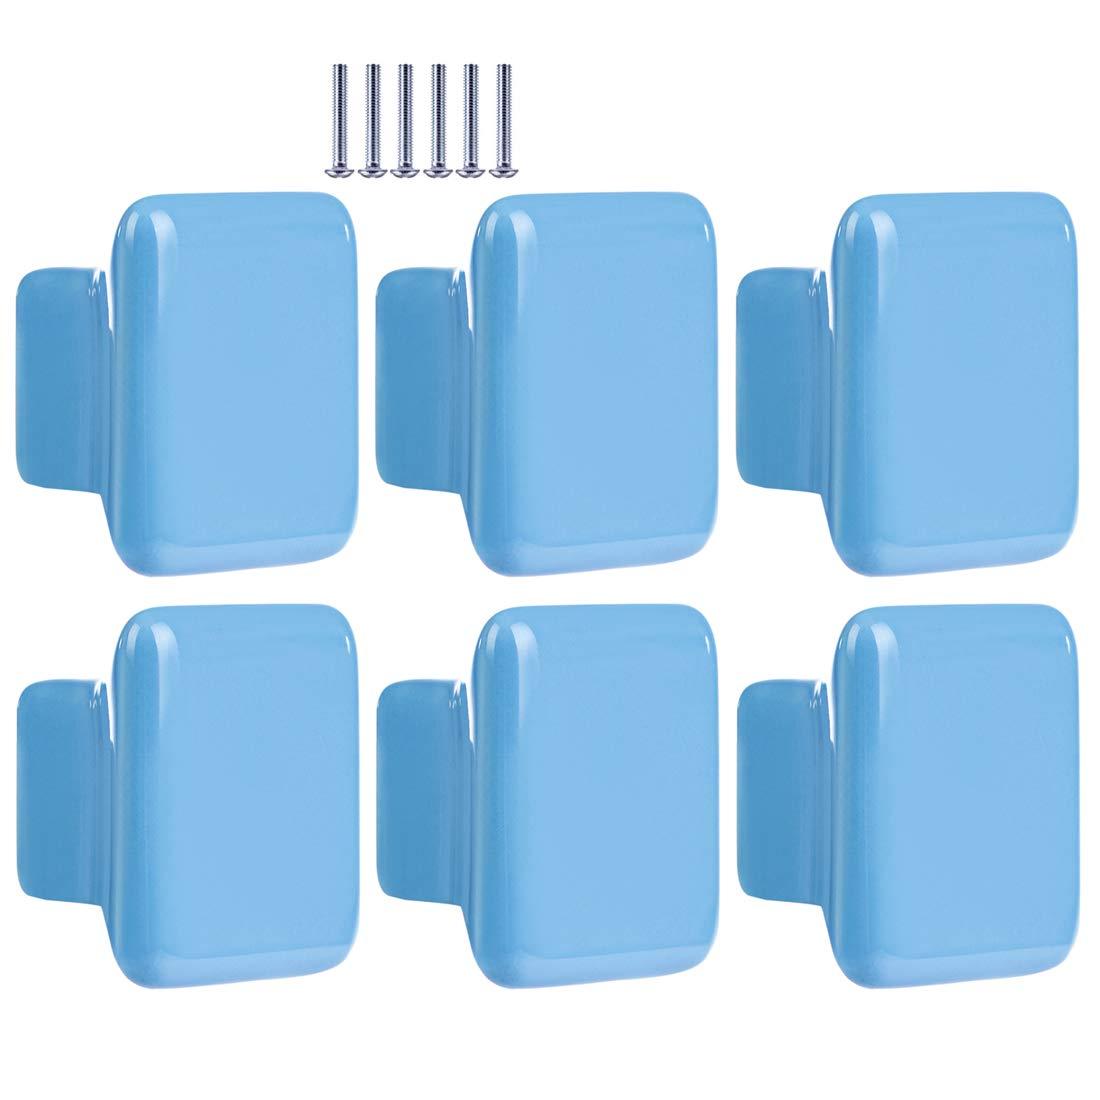 Quadratisch Blau Kinder M/öbelgriff M/öbelkn/öpfe Schrankgriffe T/ürkn/öpfe Schrankkn/öpfe Griff Knopf Batop 10Pcs M/öbelkn/öpfe Kinderzimmer 35x35x22mm